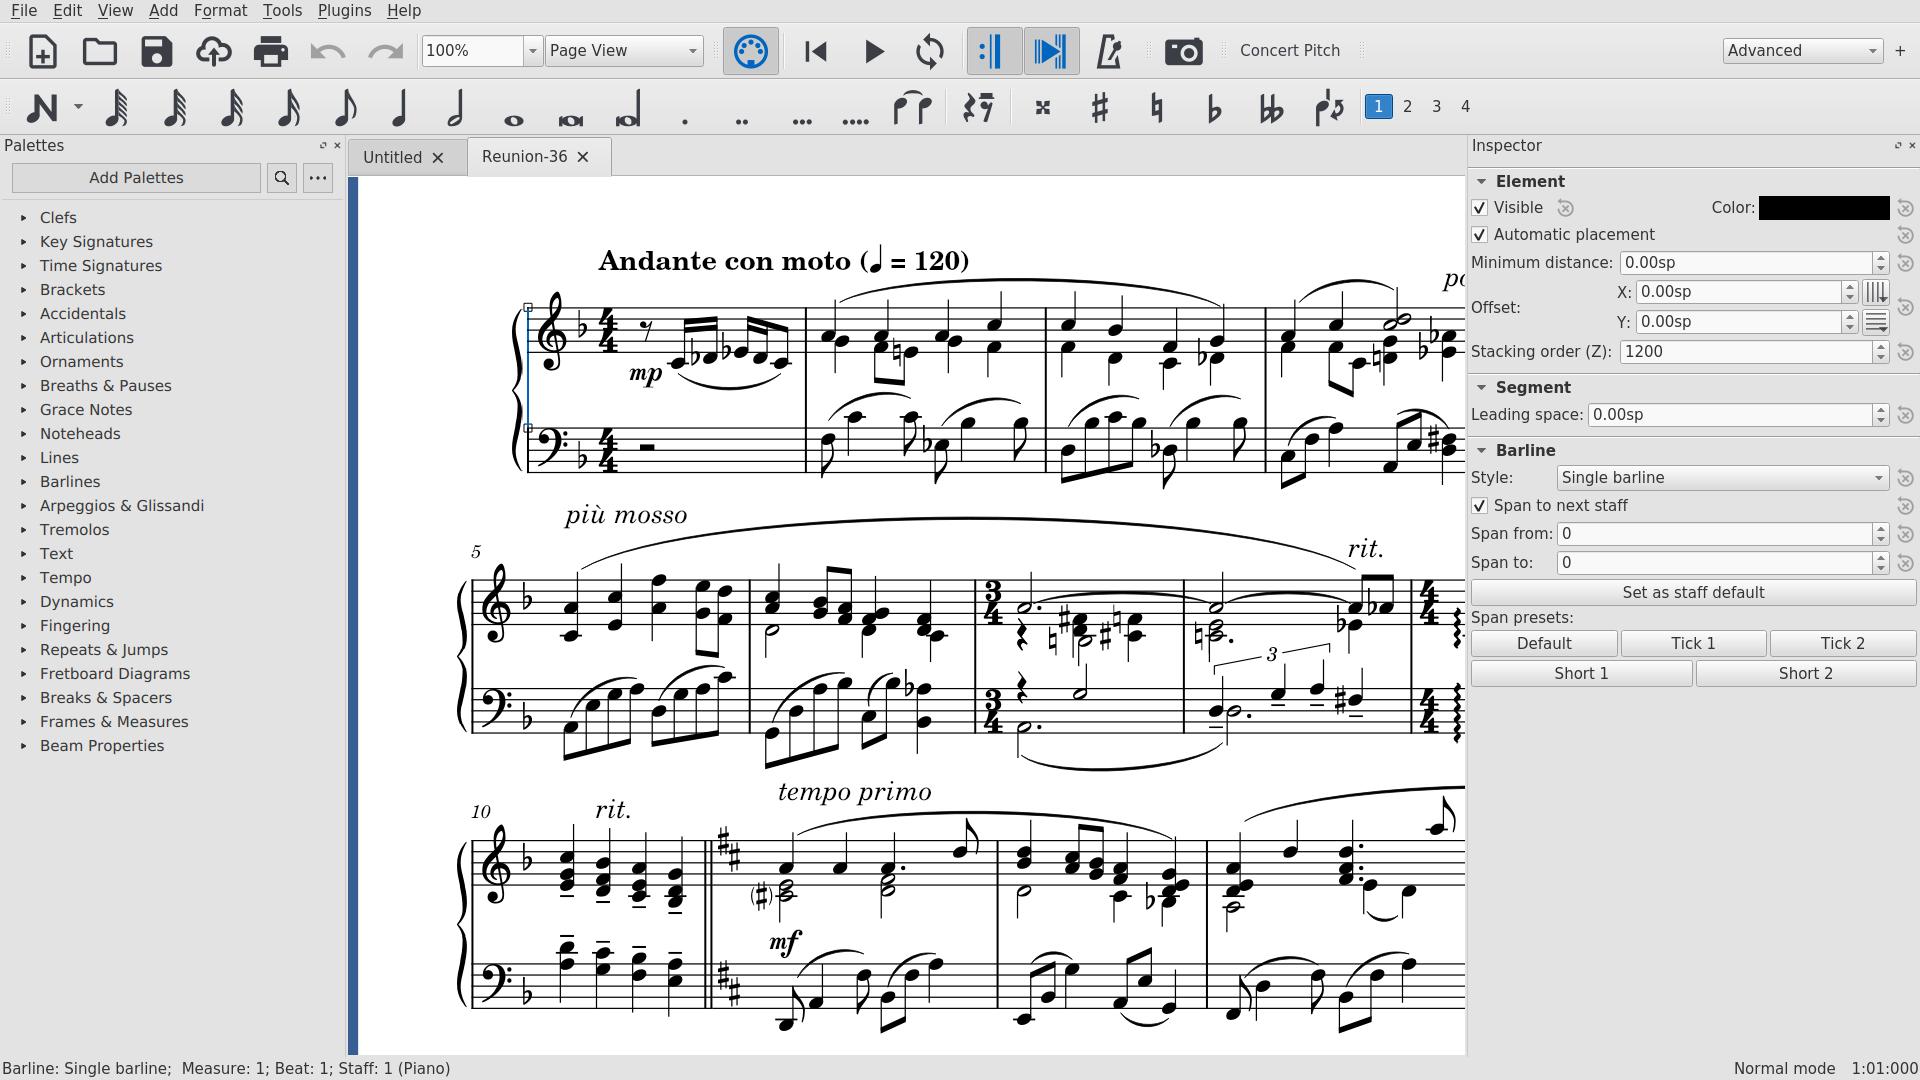 Sheet music viewed in MuseScore